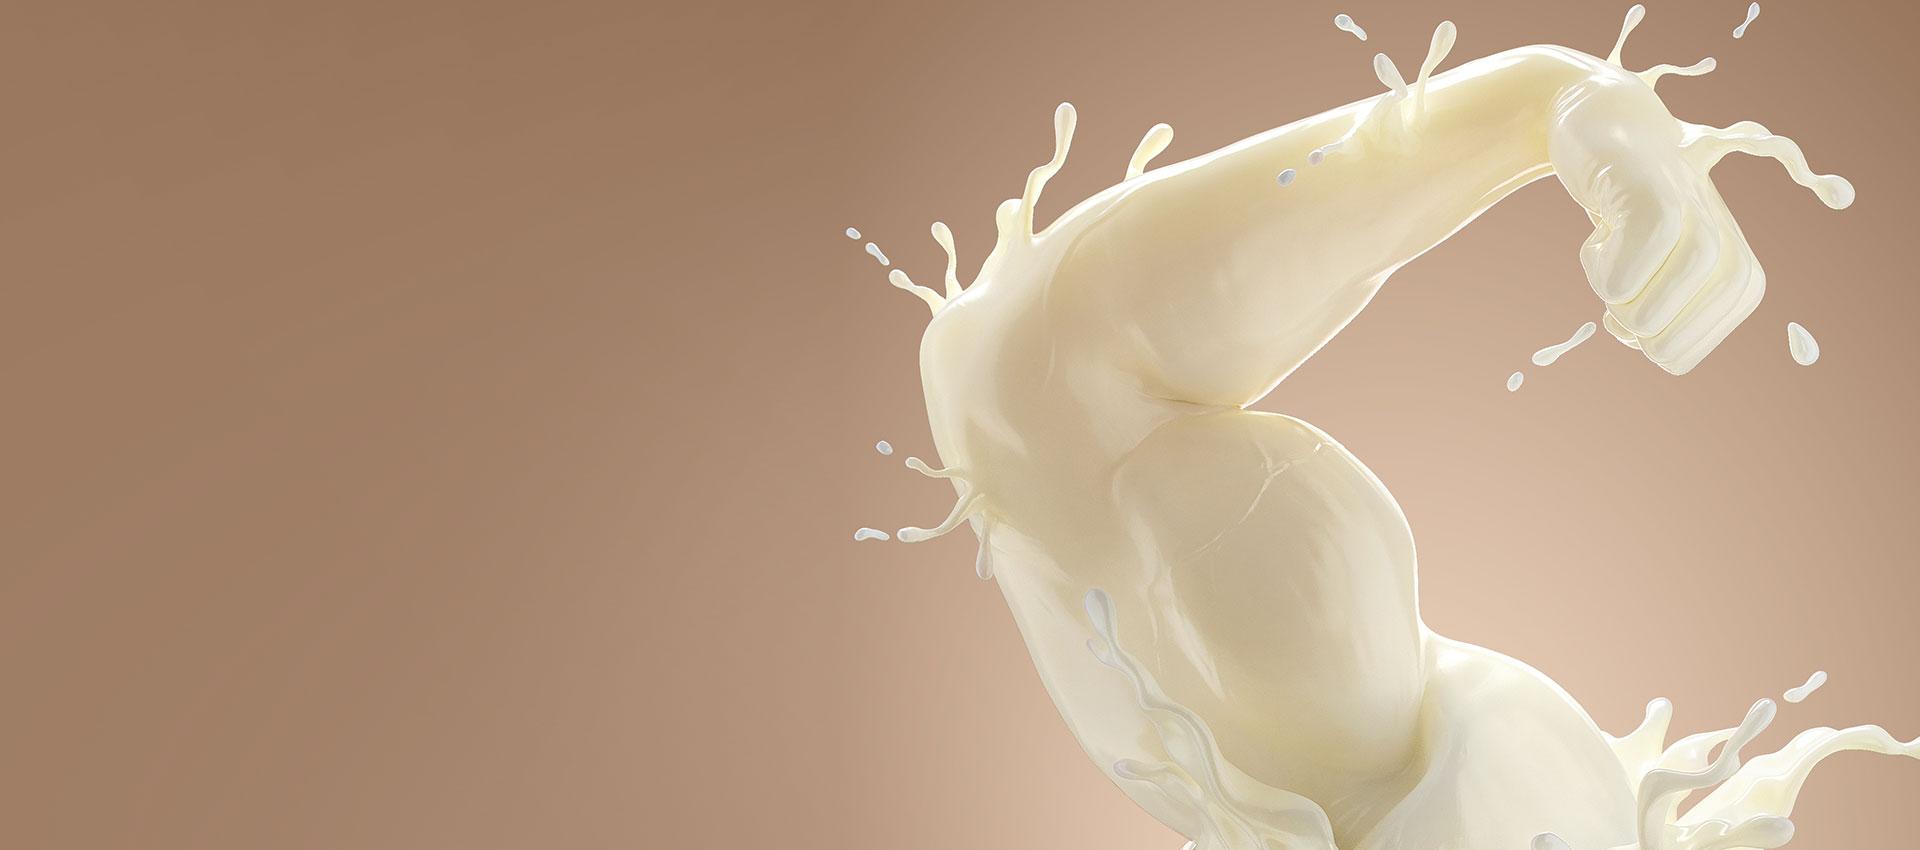 3dgraphics cgi protein shake intro